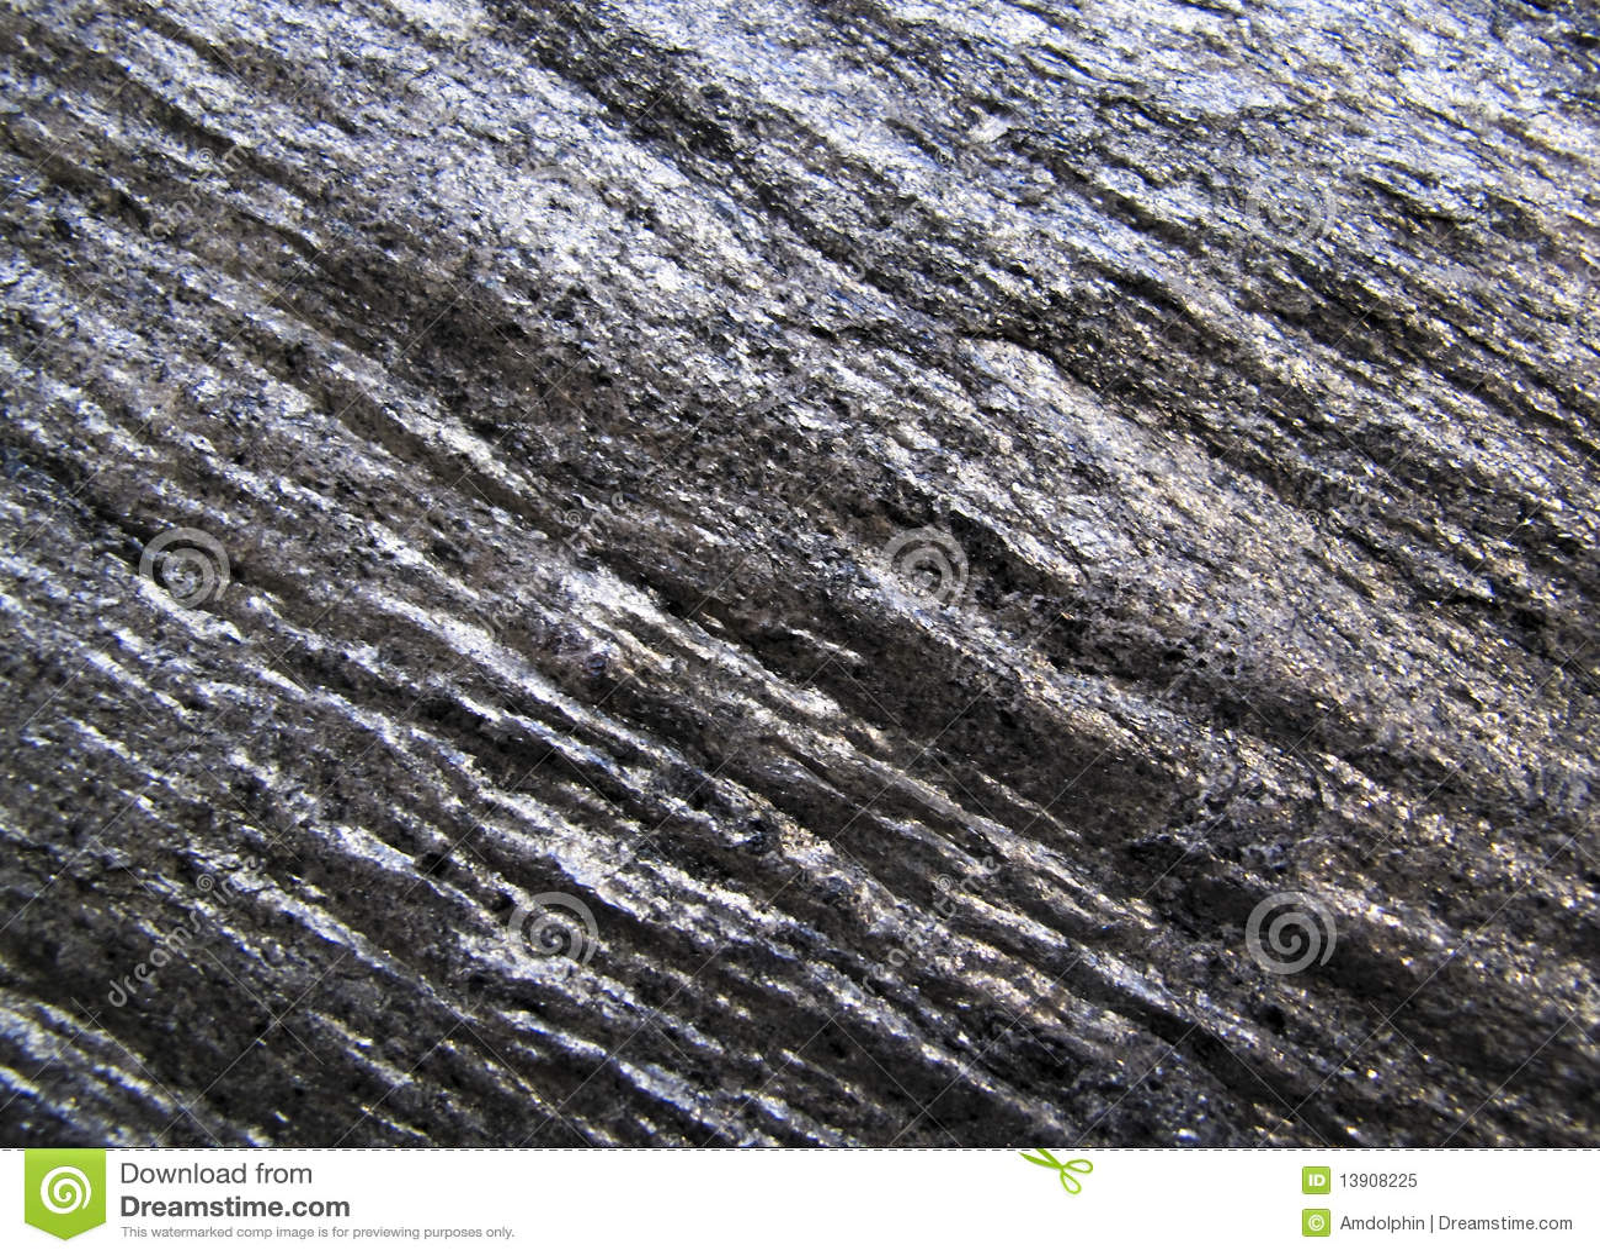 Silver rock wallpaper